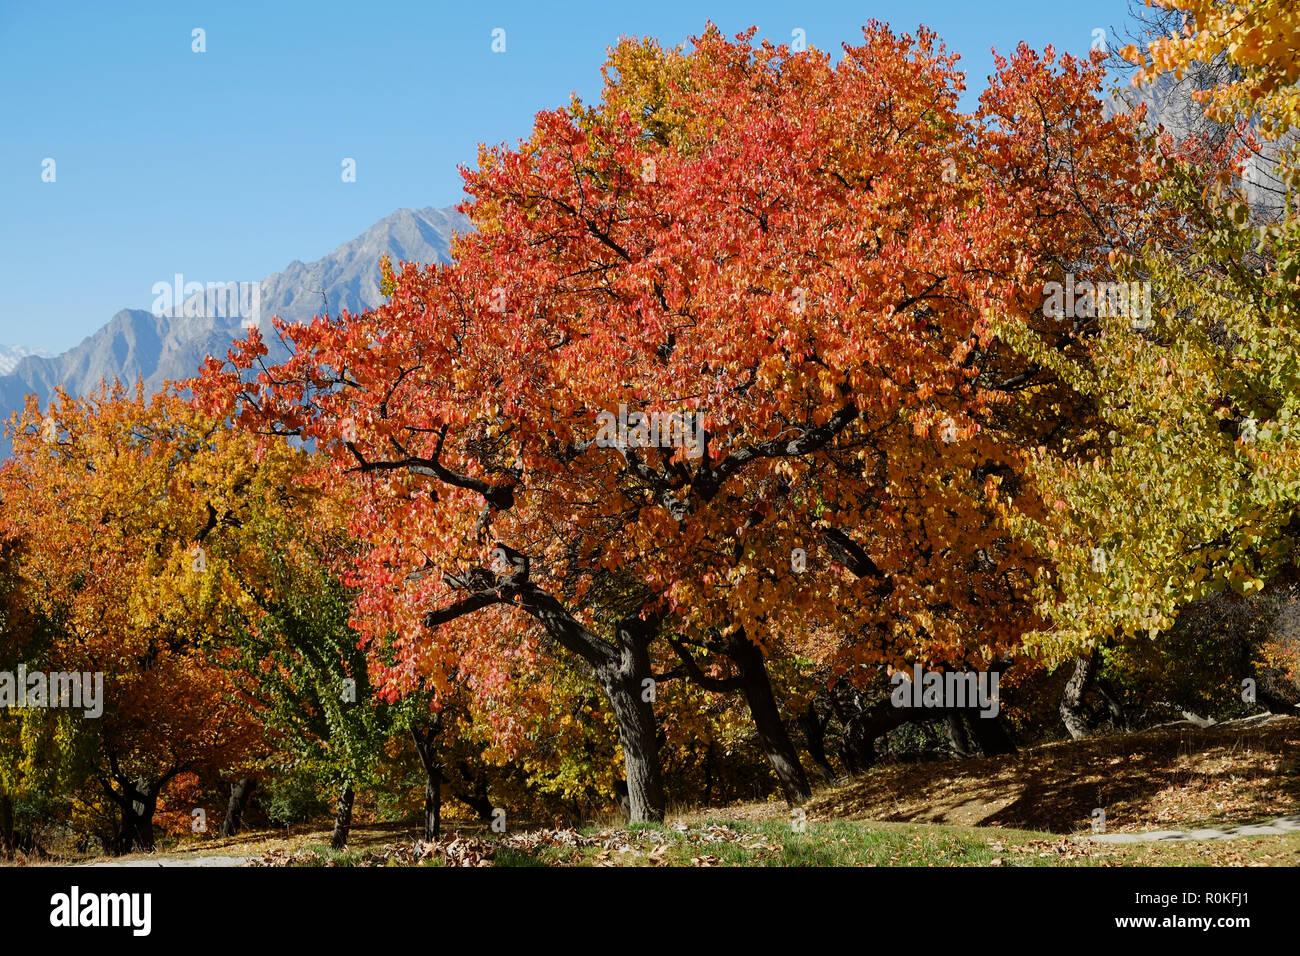 Colorful trees in autumn. Gilgit-Baltistan, Pakistan. - Stock Image